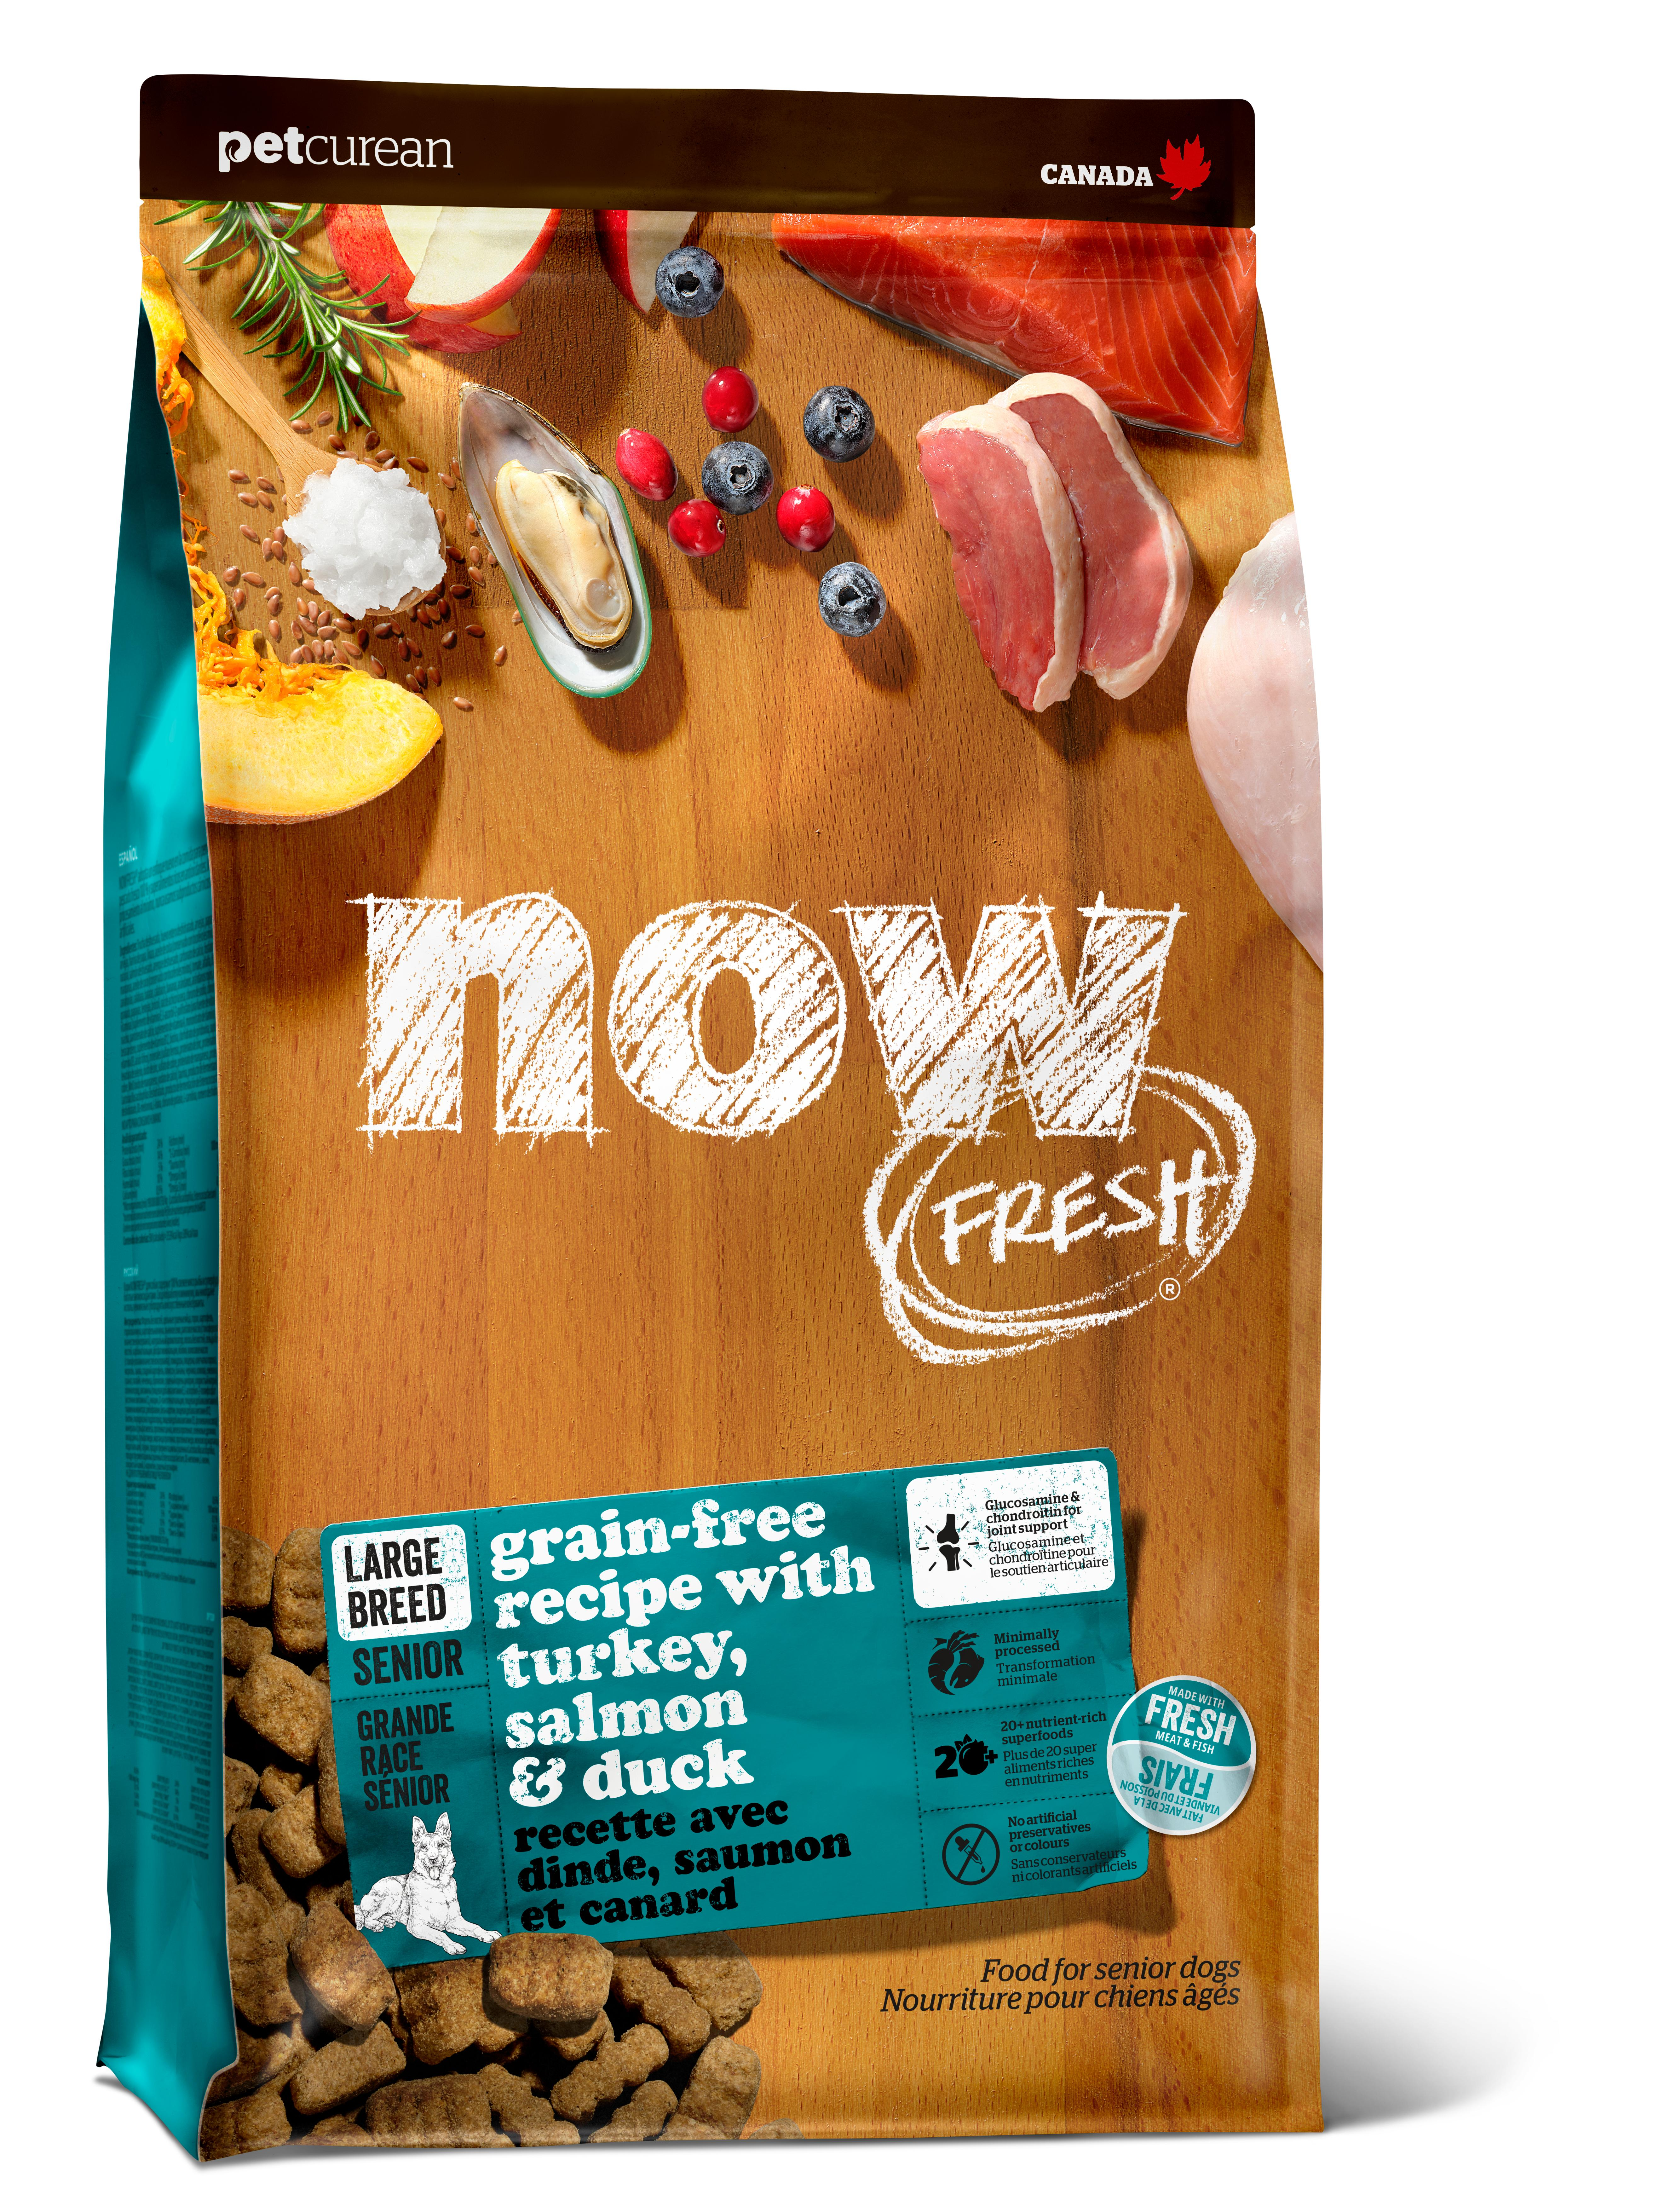 NOW FRESH Large Breed Senior Recipe Grain-Free Dry Dog Food, 25-lb